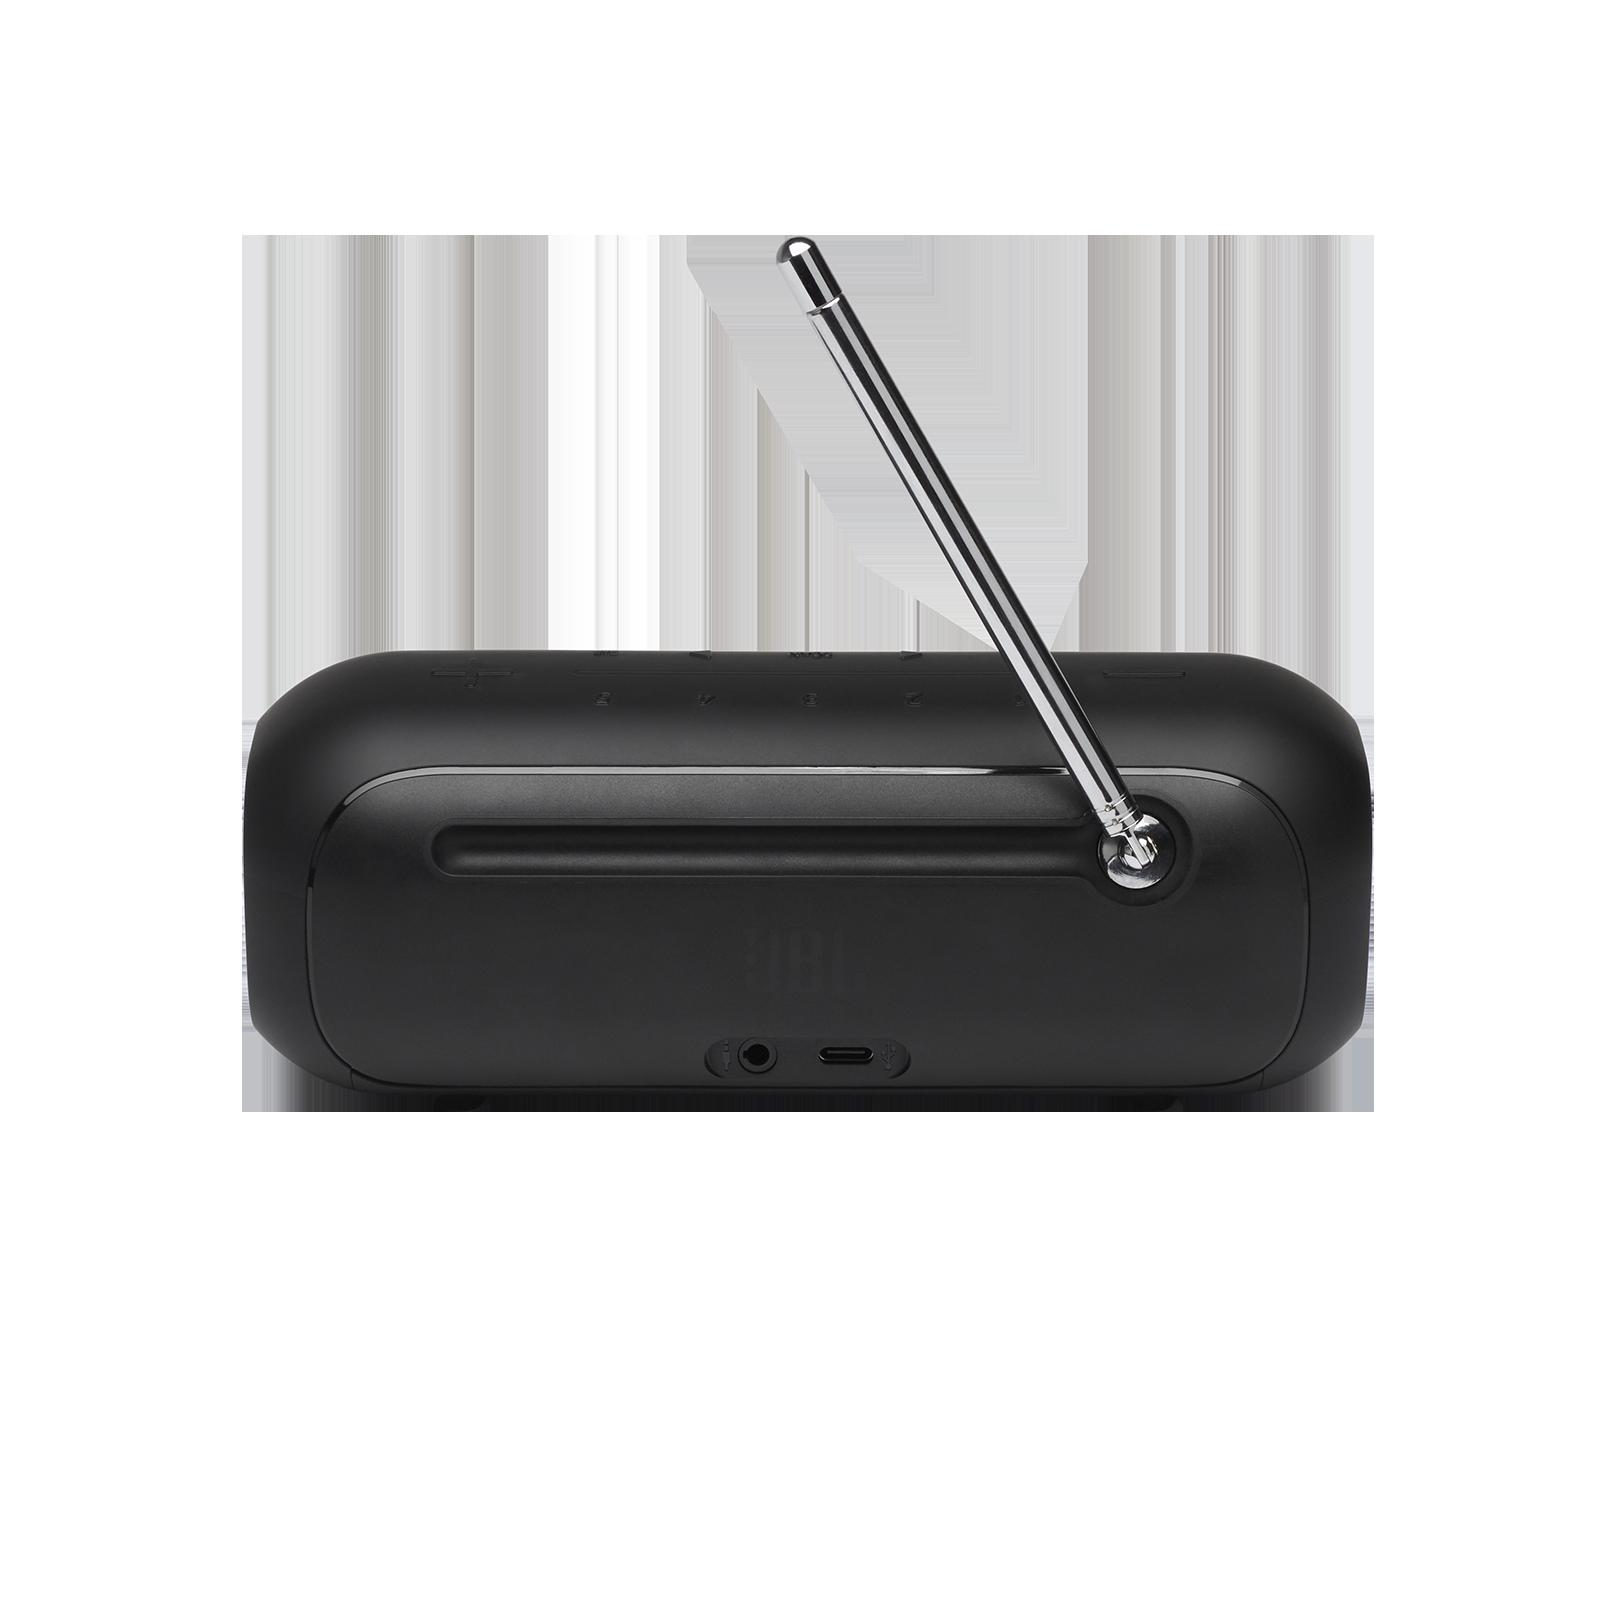 JBL Tuner 2 - Black - Portable DAB/DAB+/FM radio with Bluetooth - Back